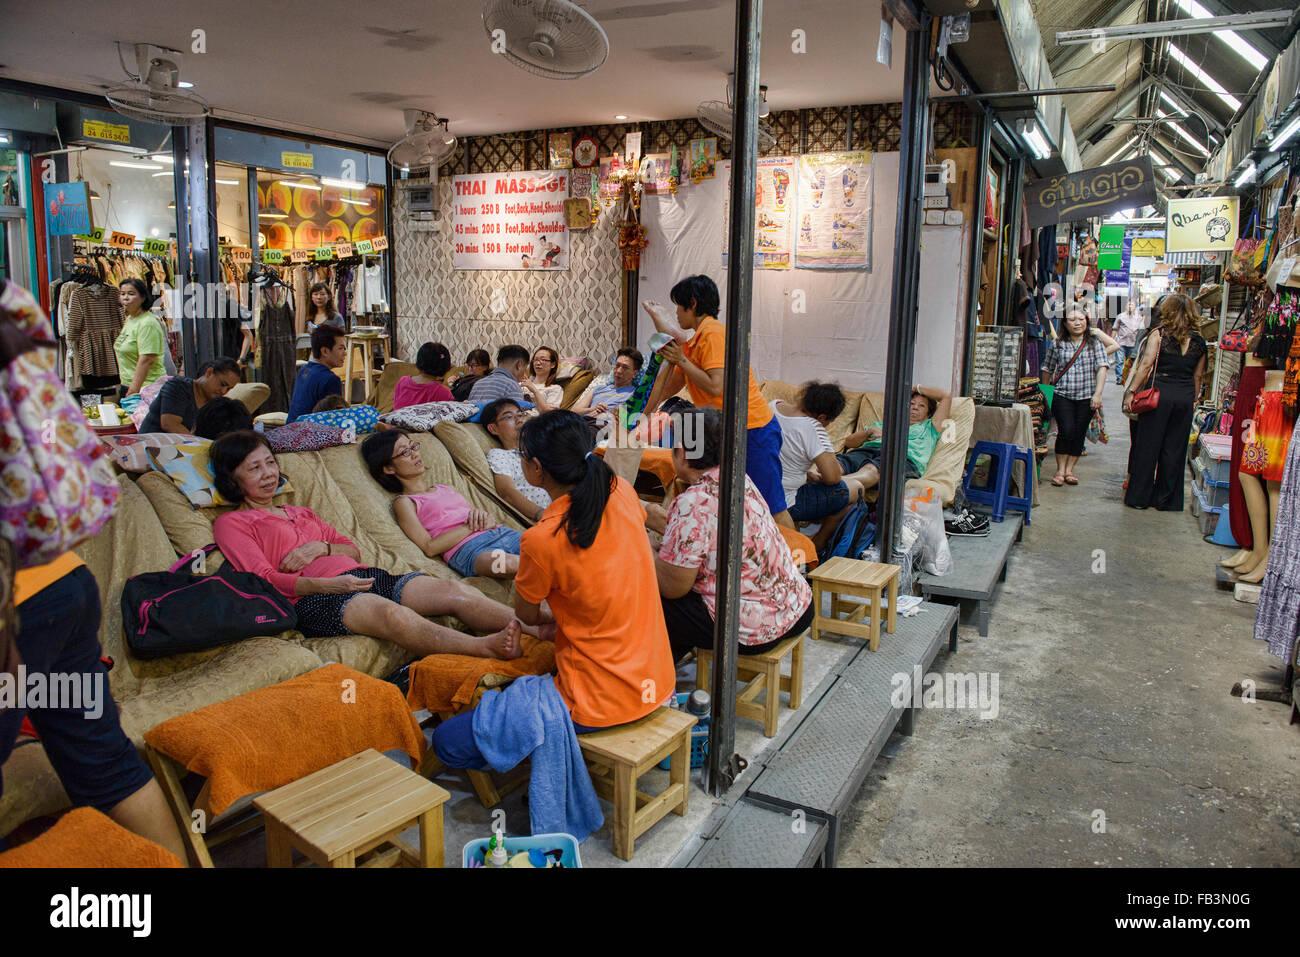 massage bangkok gratis snuskfilm